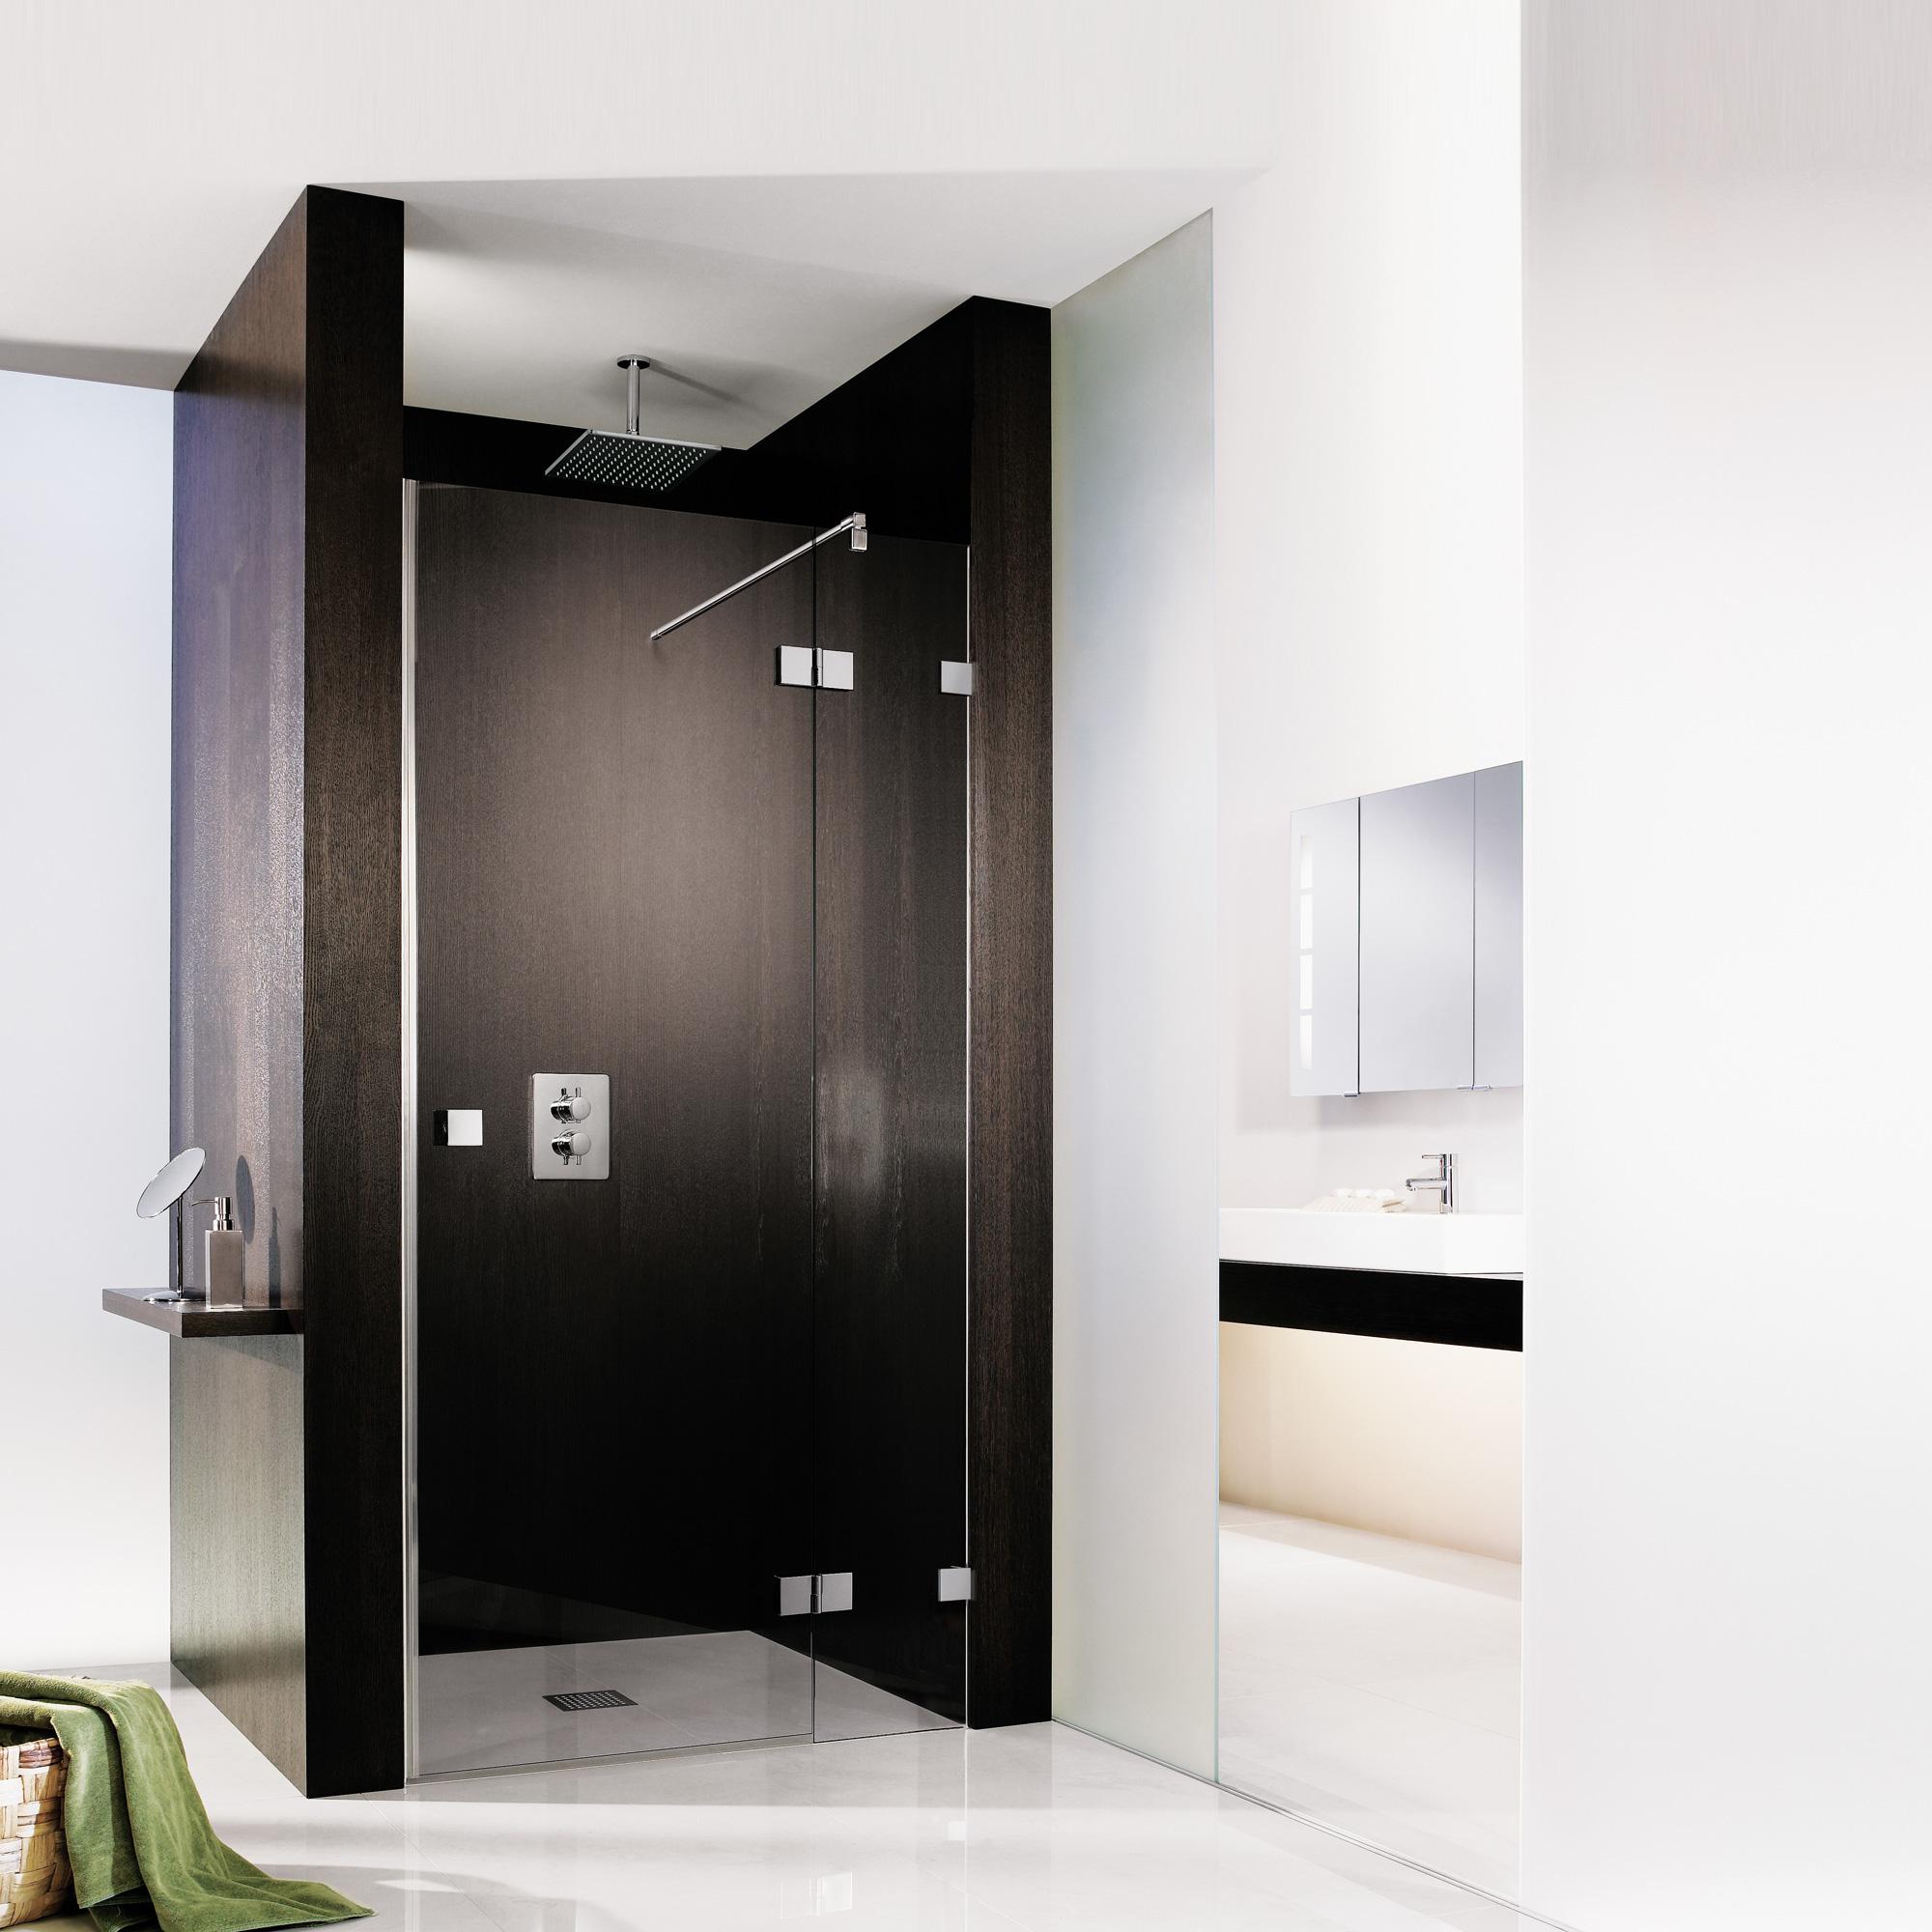 hsk atelier pur dreht r in nische klar hell chrom reuter onlineshop. Black Bedroom Furniture Sets. Home Design Ideas